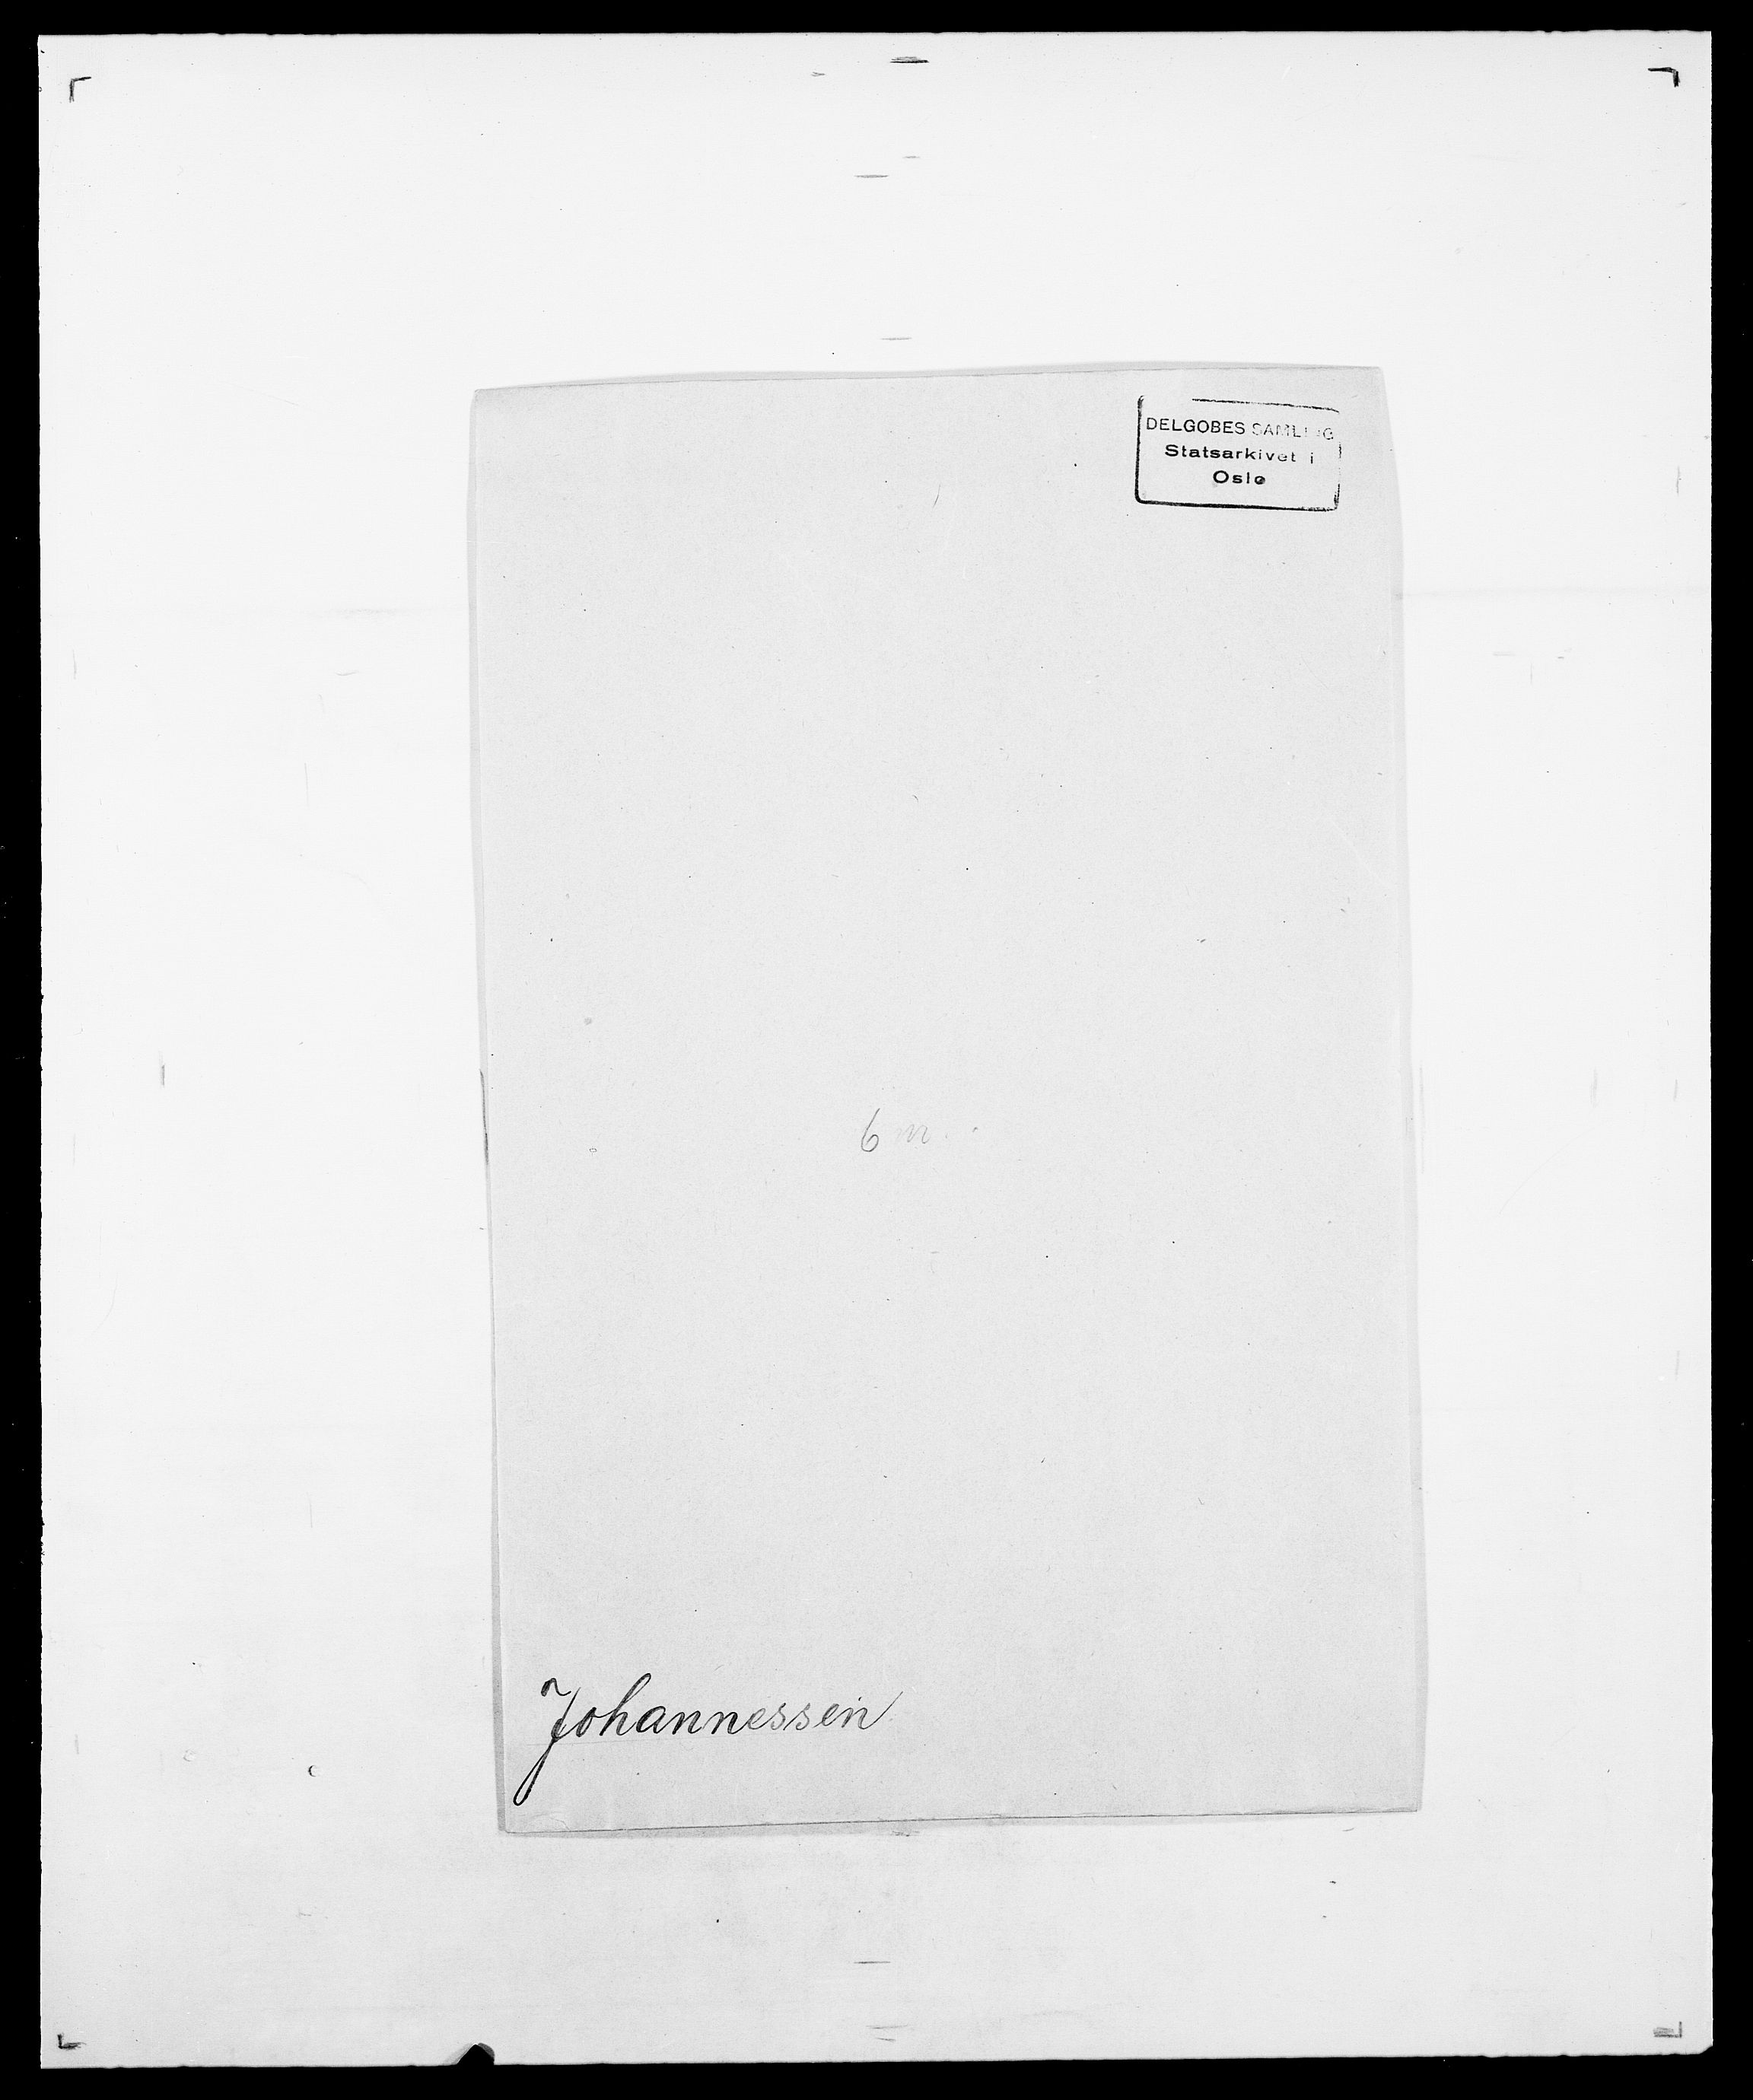 SAO, Delgobe, Charles Antoine - samling, D/Da/L0019: van der Hude - Joys, s. 810